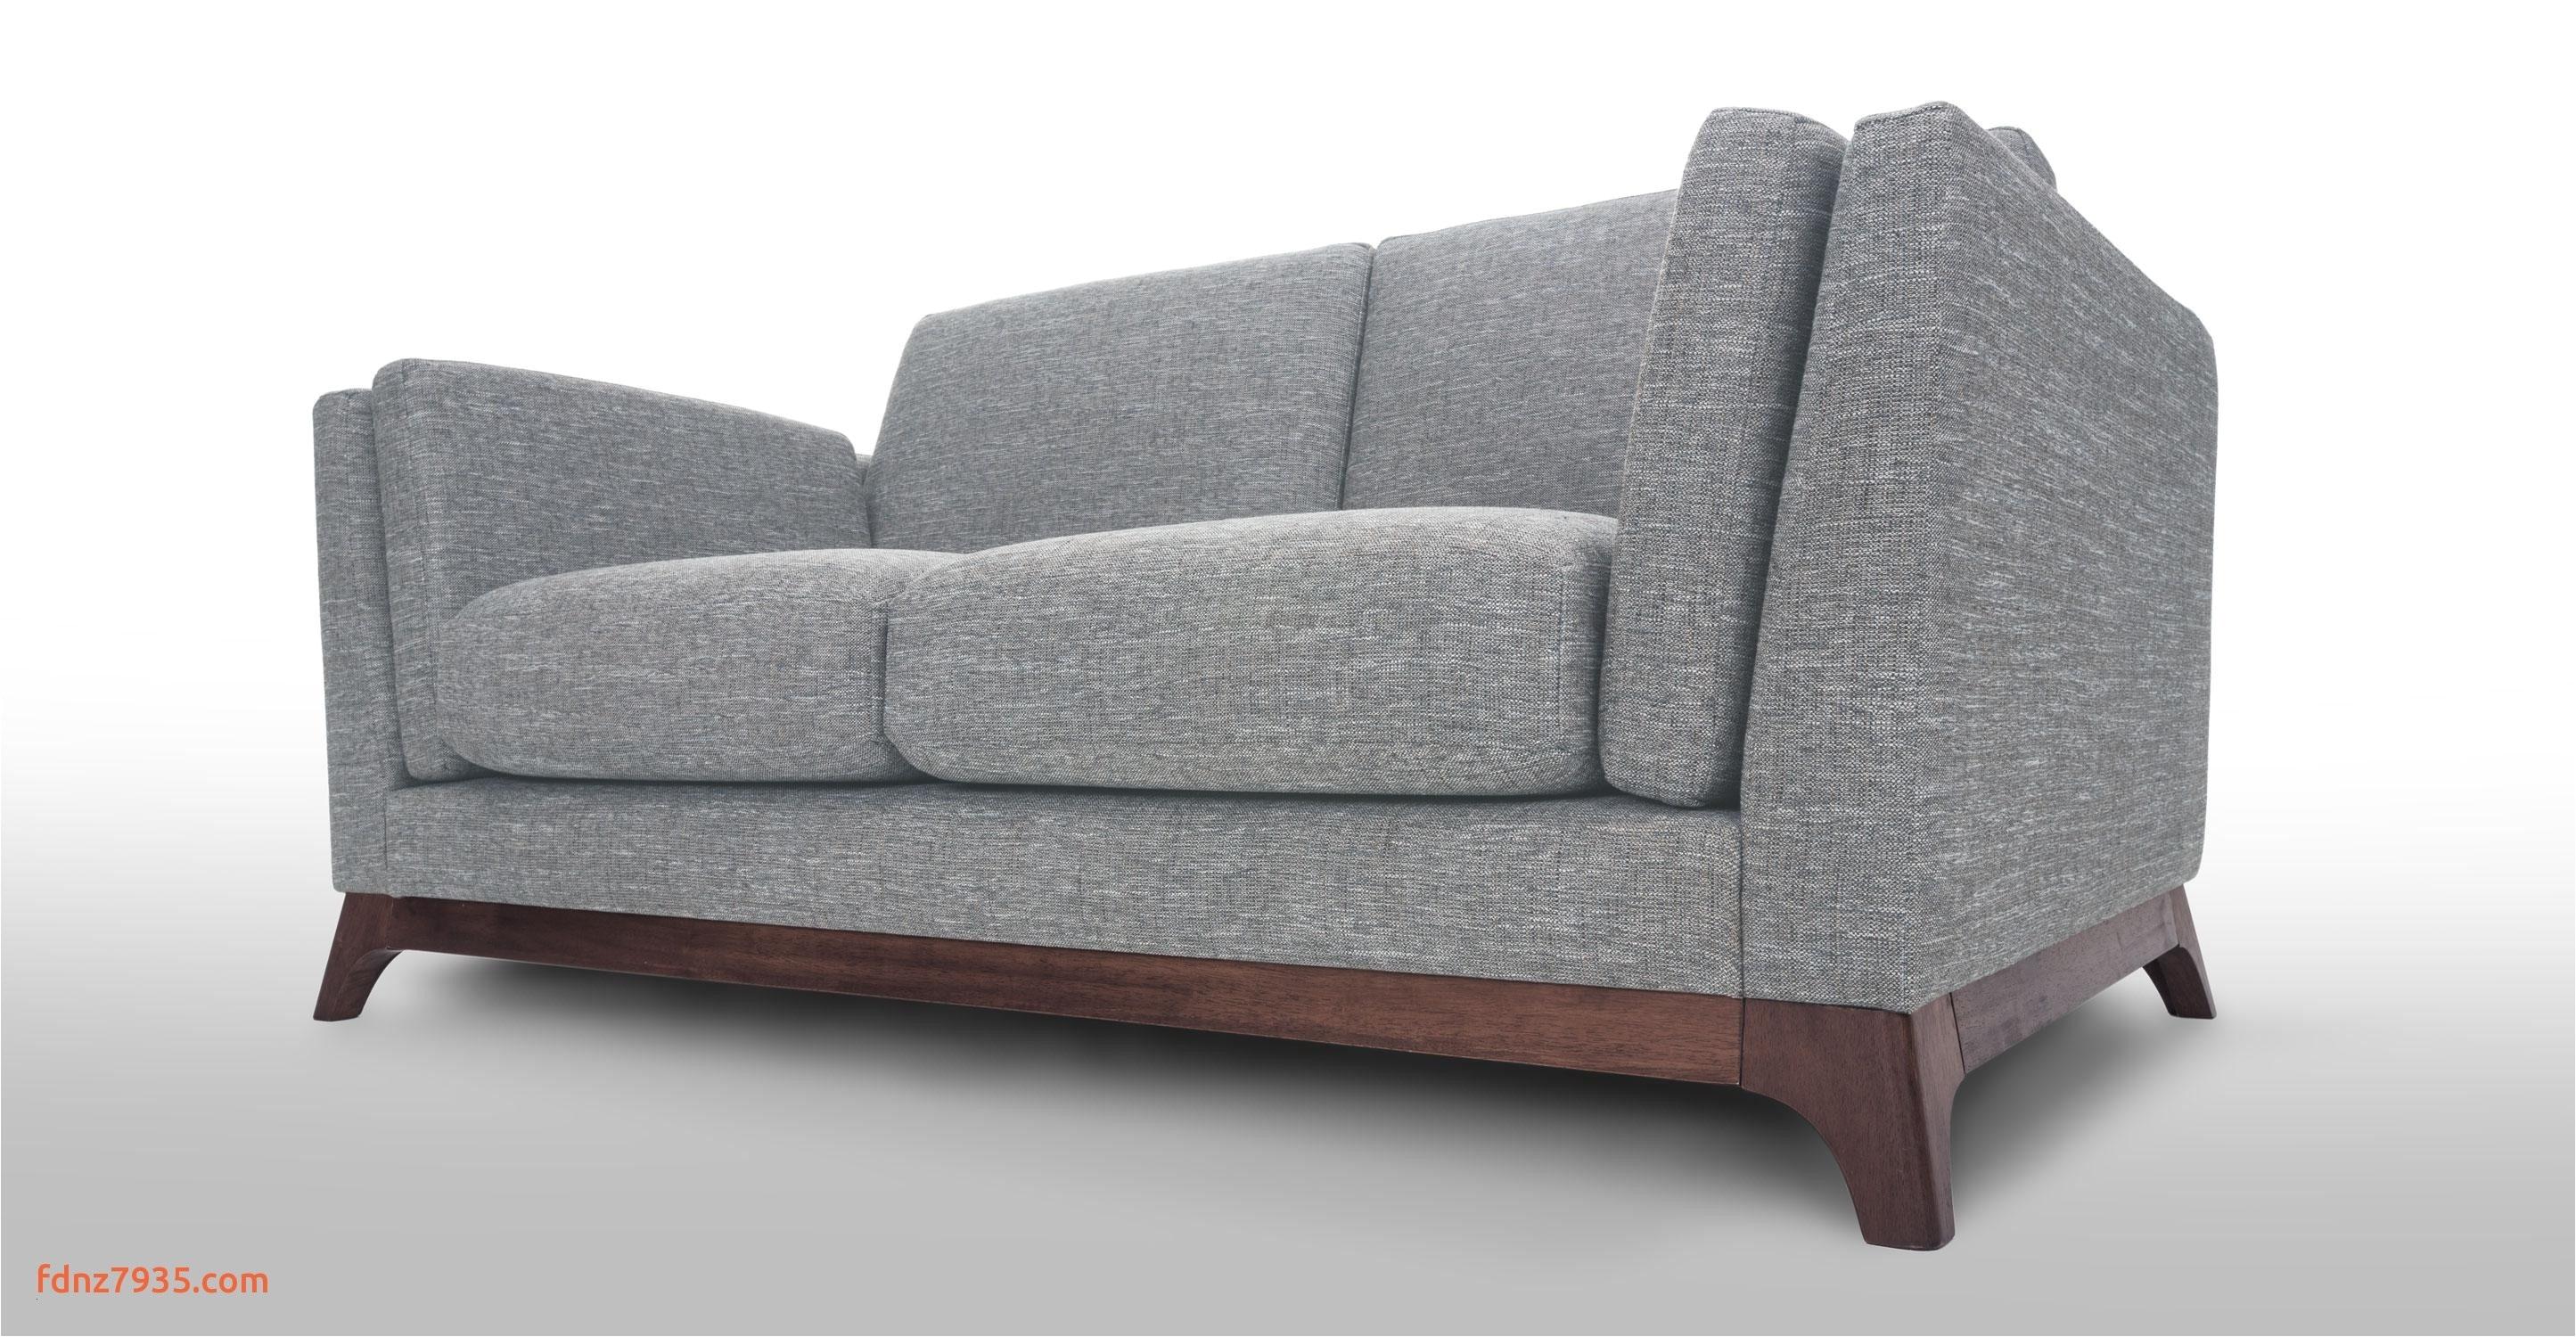 outdoor furniture seattle luxury sleeper sofa seattle fresh sofa design